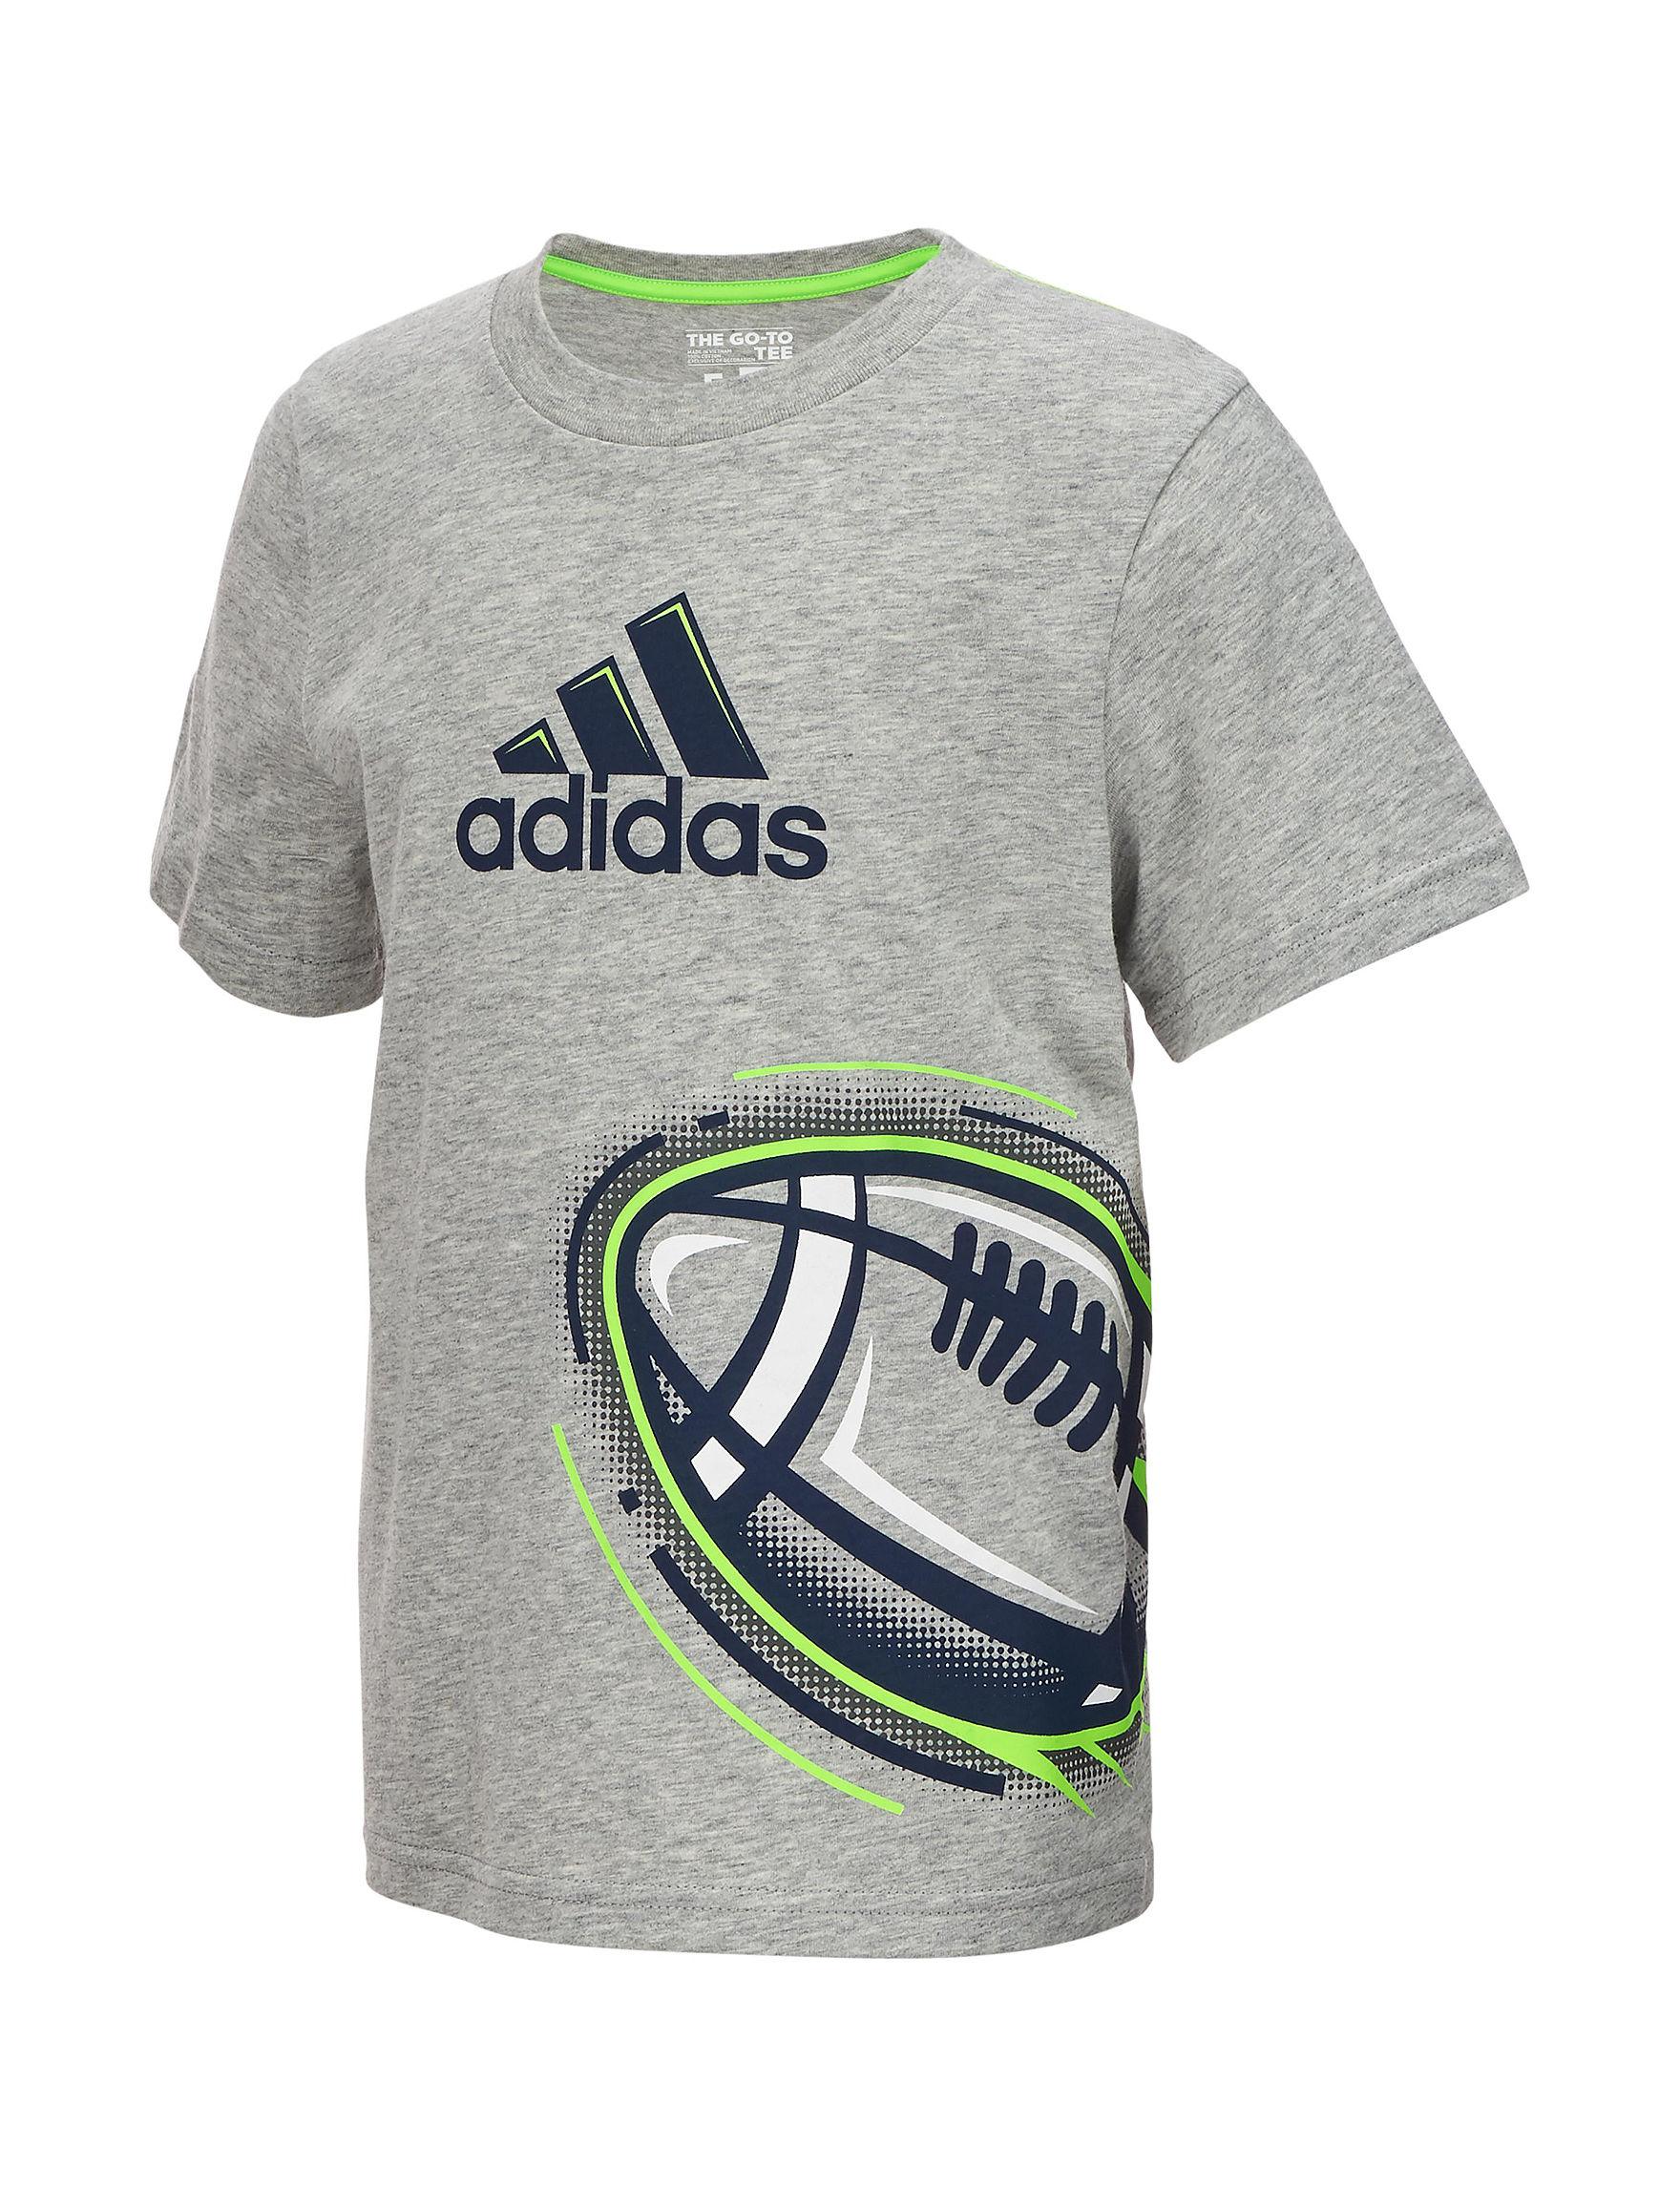 Adidas Charcoal